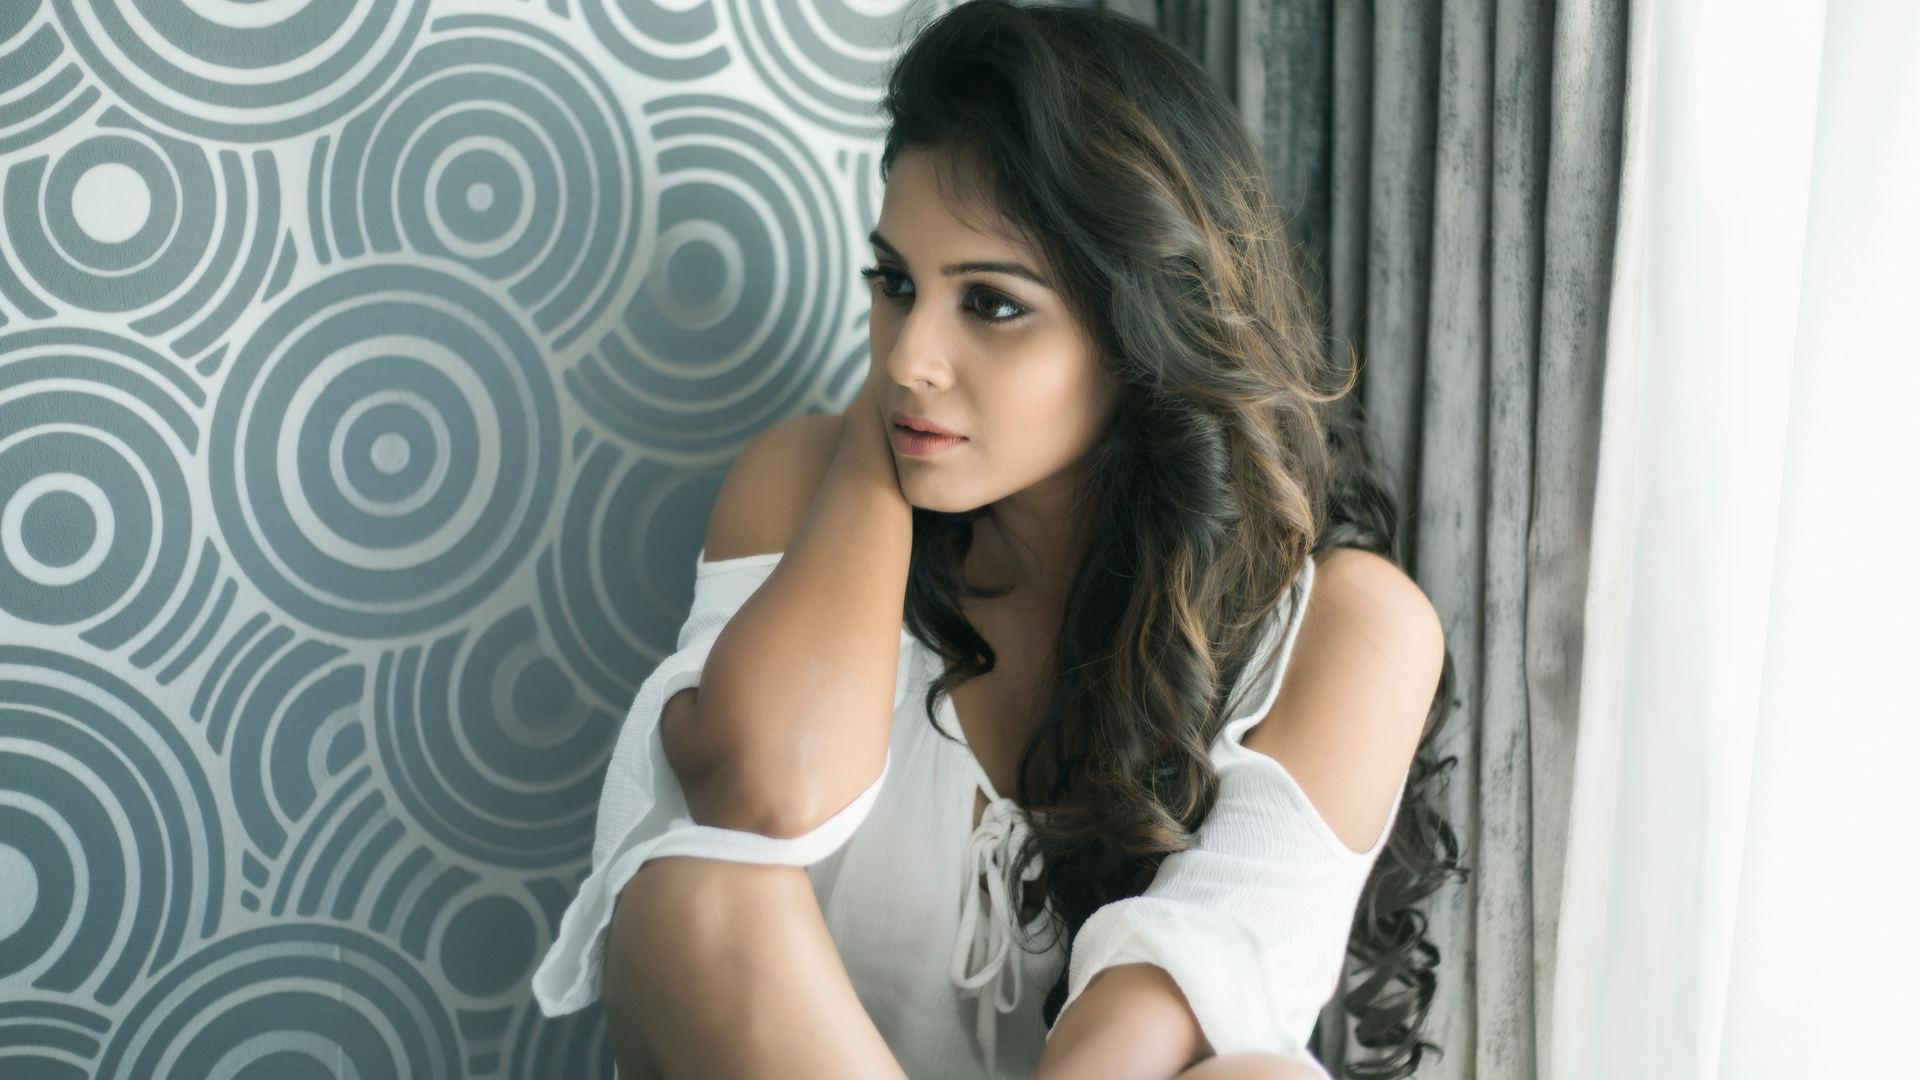 Actress Chandini signs consecutive projects with Balaji Sakthivel & Radha Mohan-SJ Suryah